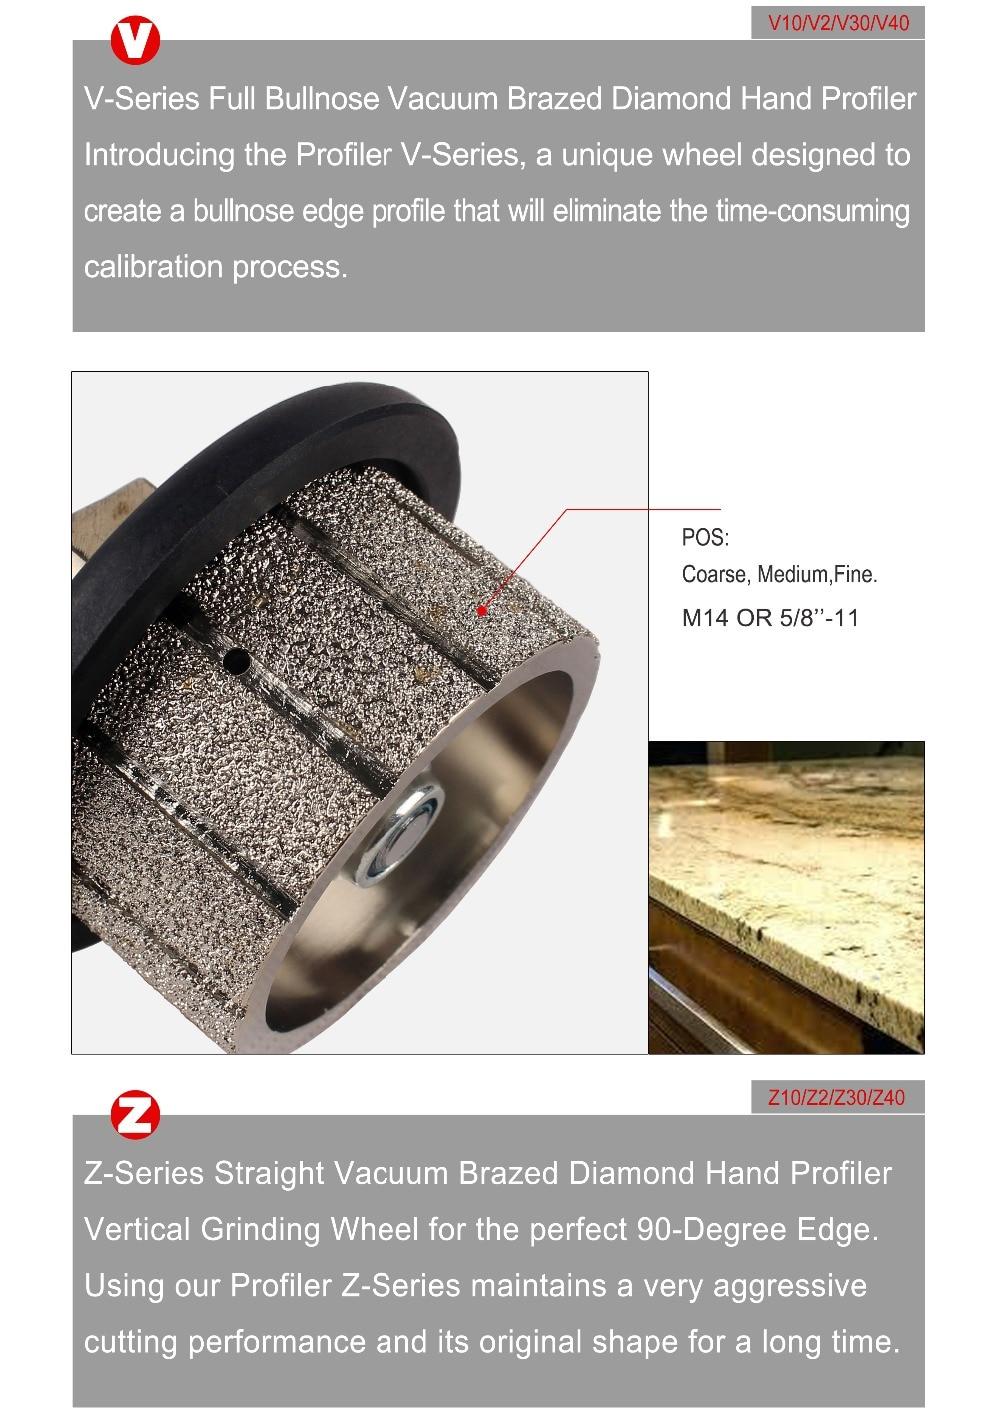 "Full Bullnose Vacuum Brazed Granite Diamond Profile Wheel Marble Hand Profiling Wheels 5/8""-11"